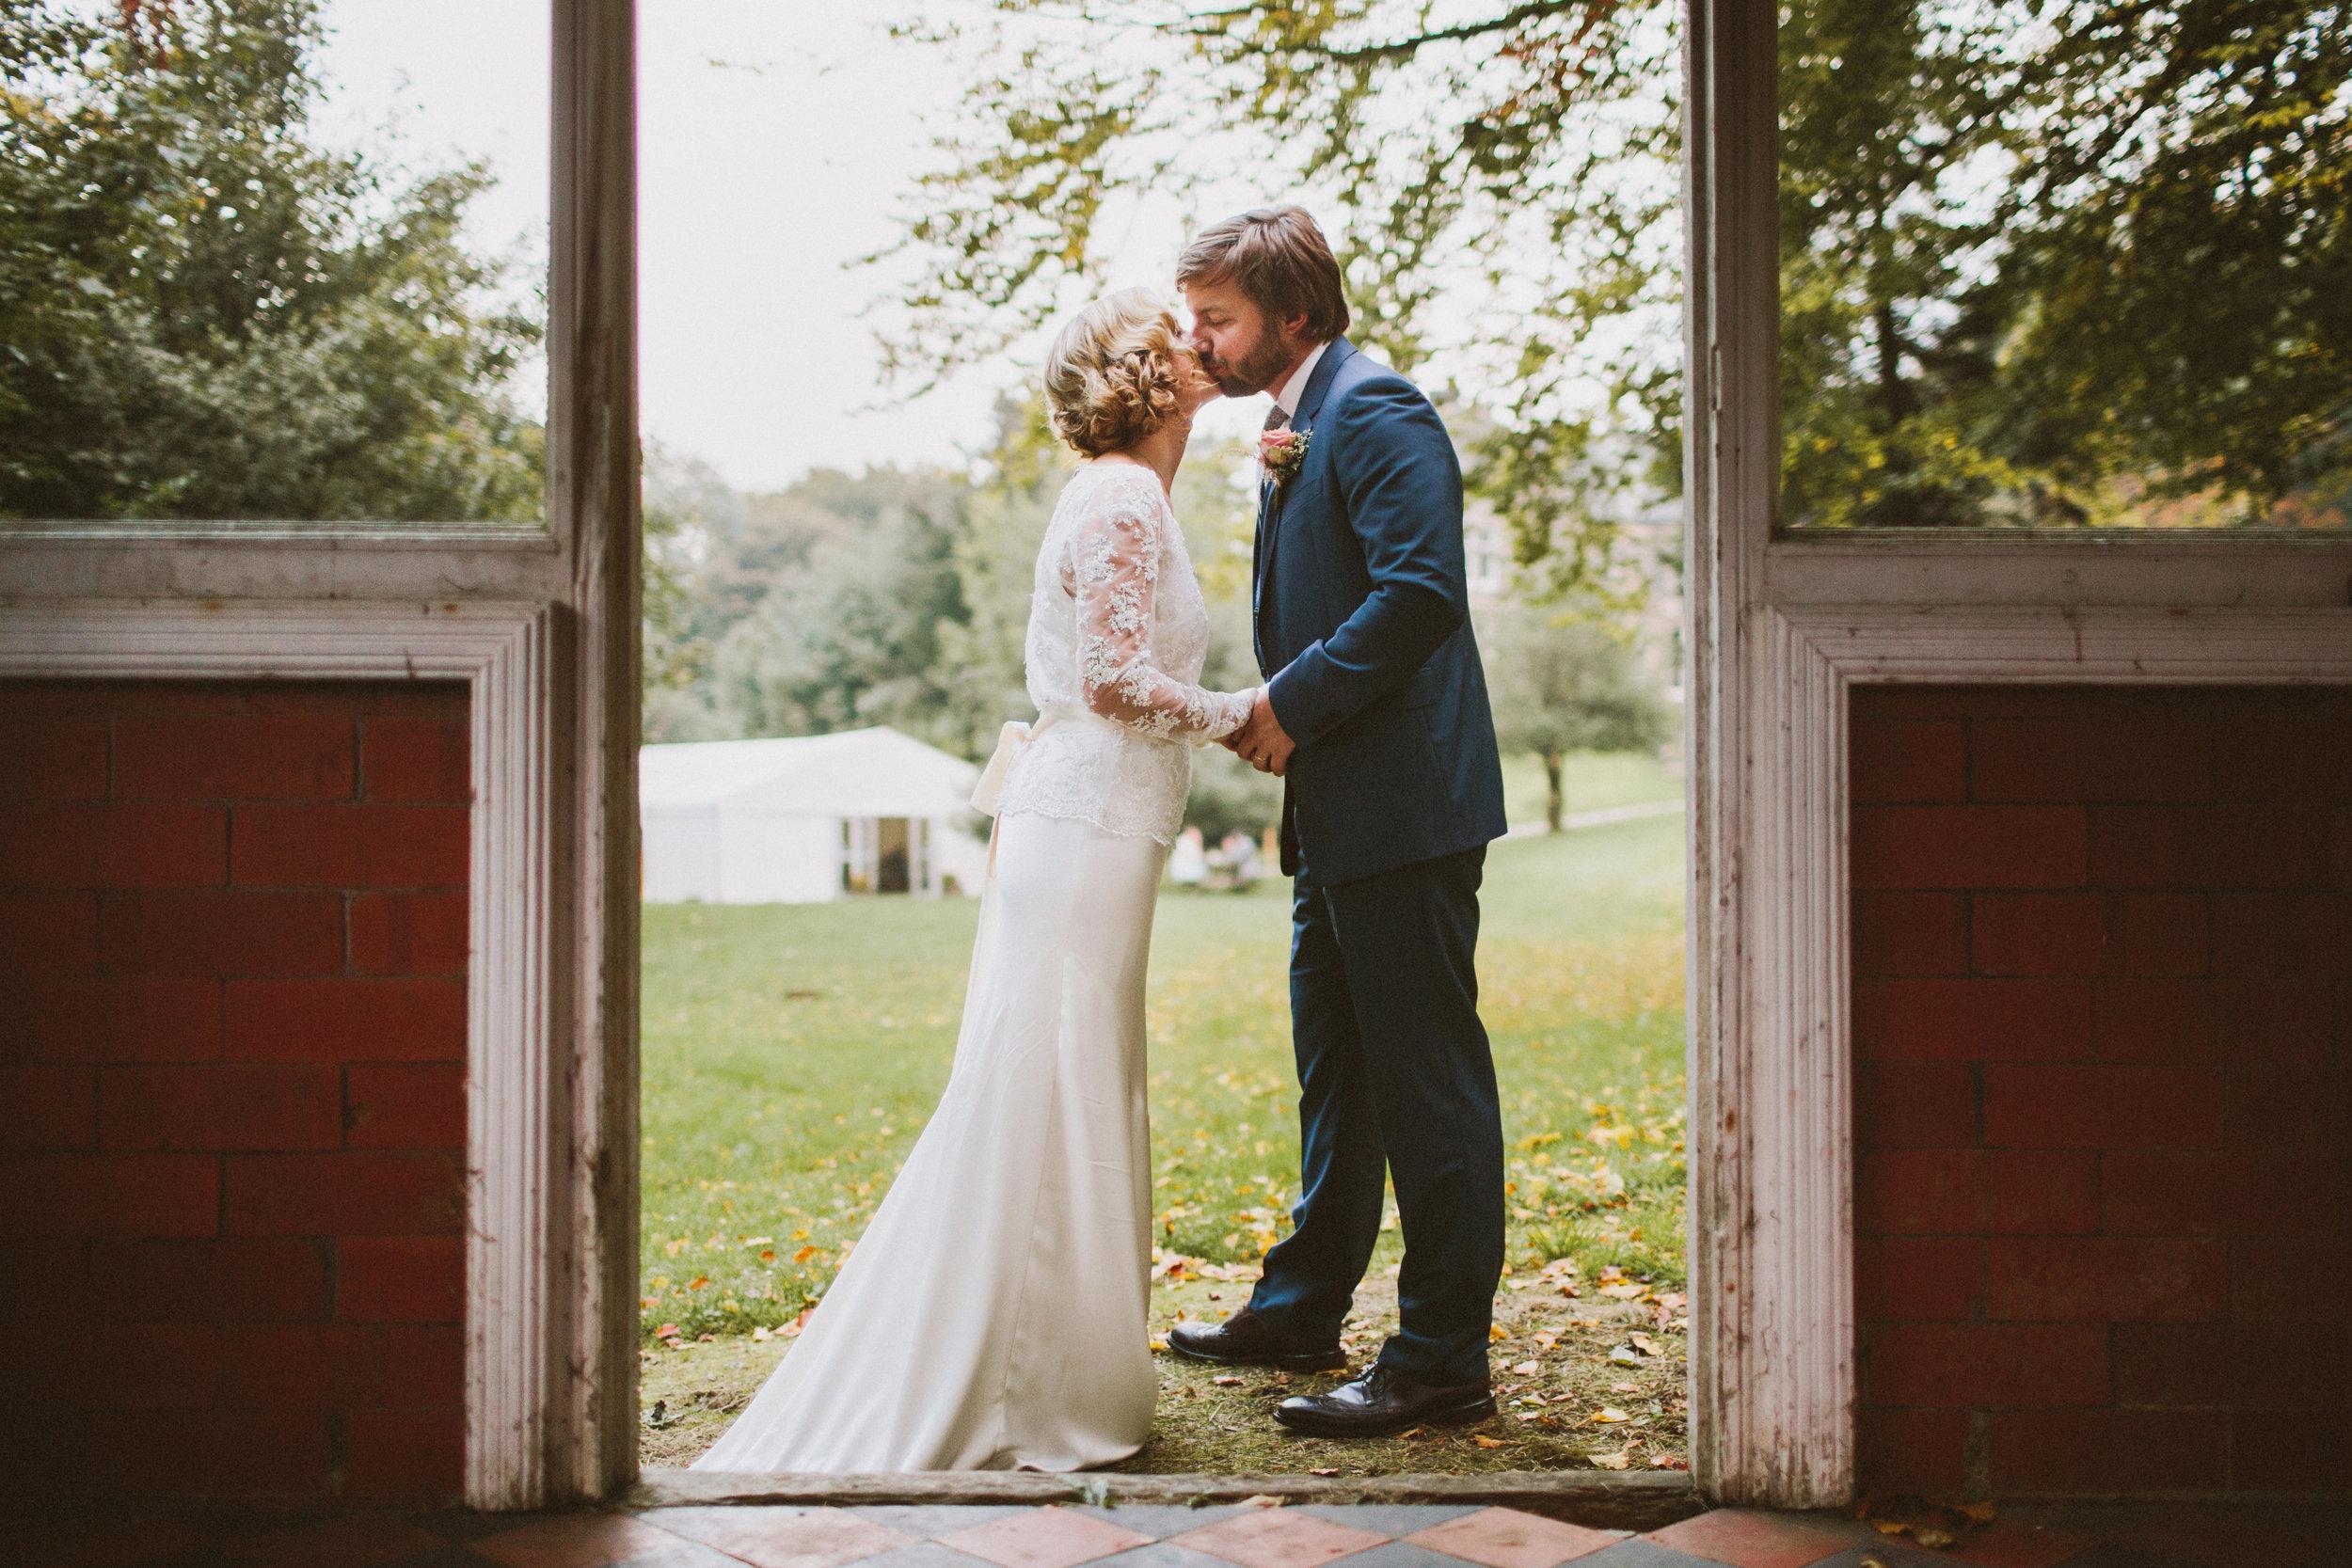 Jo-Peak-District-Autumn-Wedding-Bespoke-Vintage-Bias-Wedding-Gown-Lace-Jacket-Susanna-Greening-Matlock-18